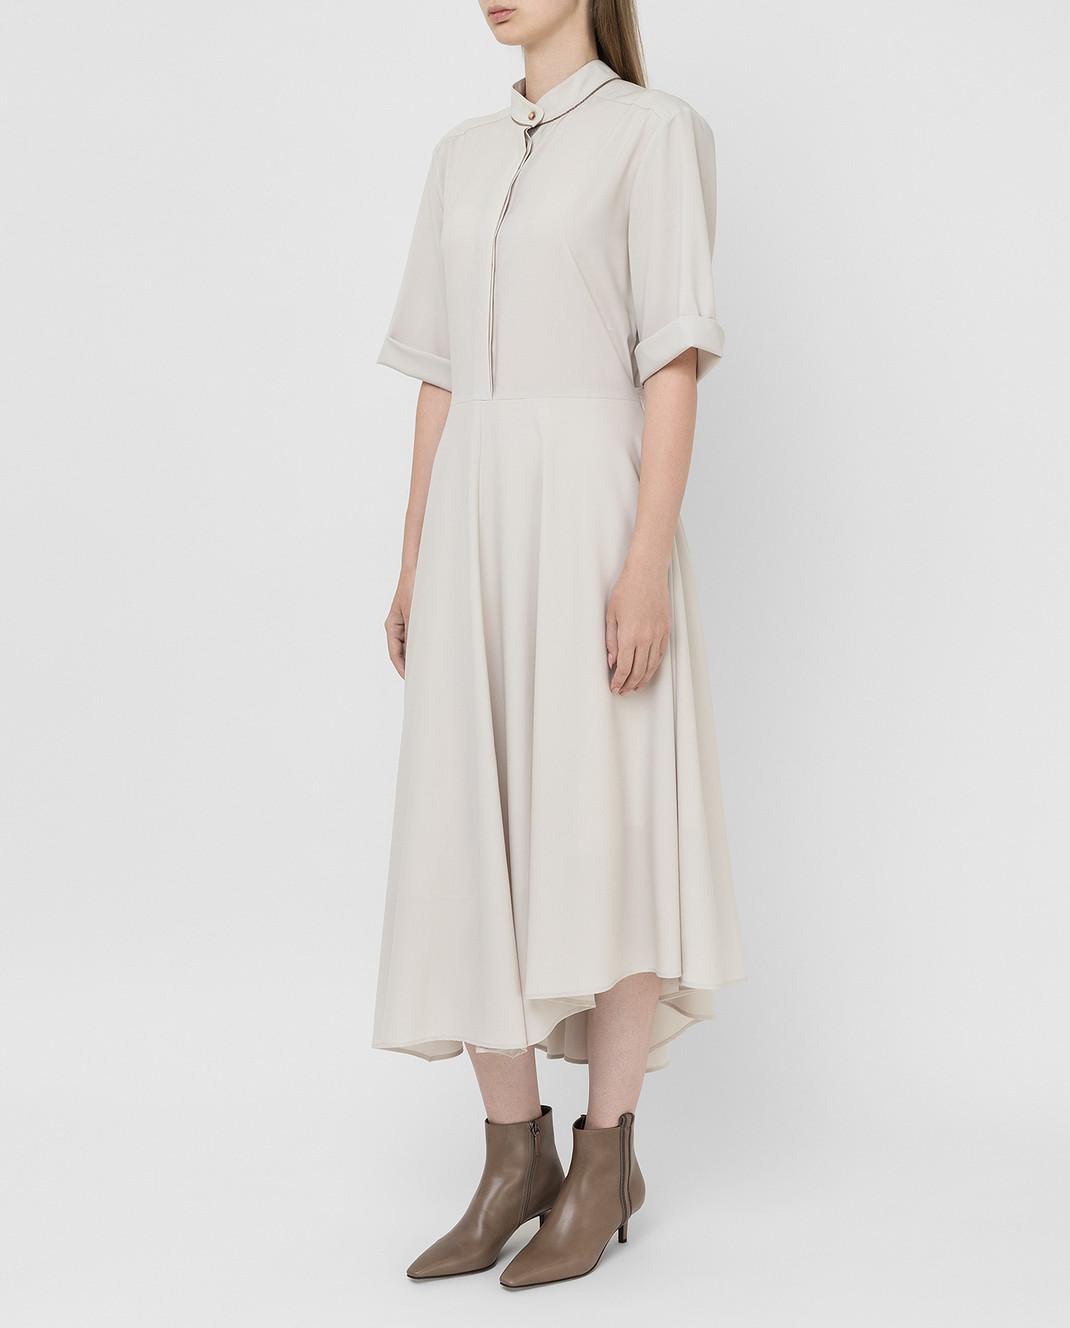 Brunello Cucinelli Светло-бежевое платье из шерсти изображение 3